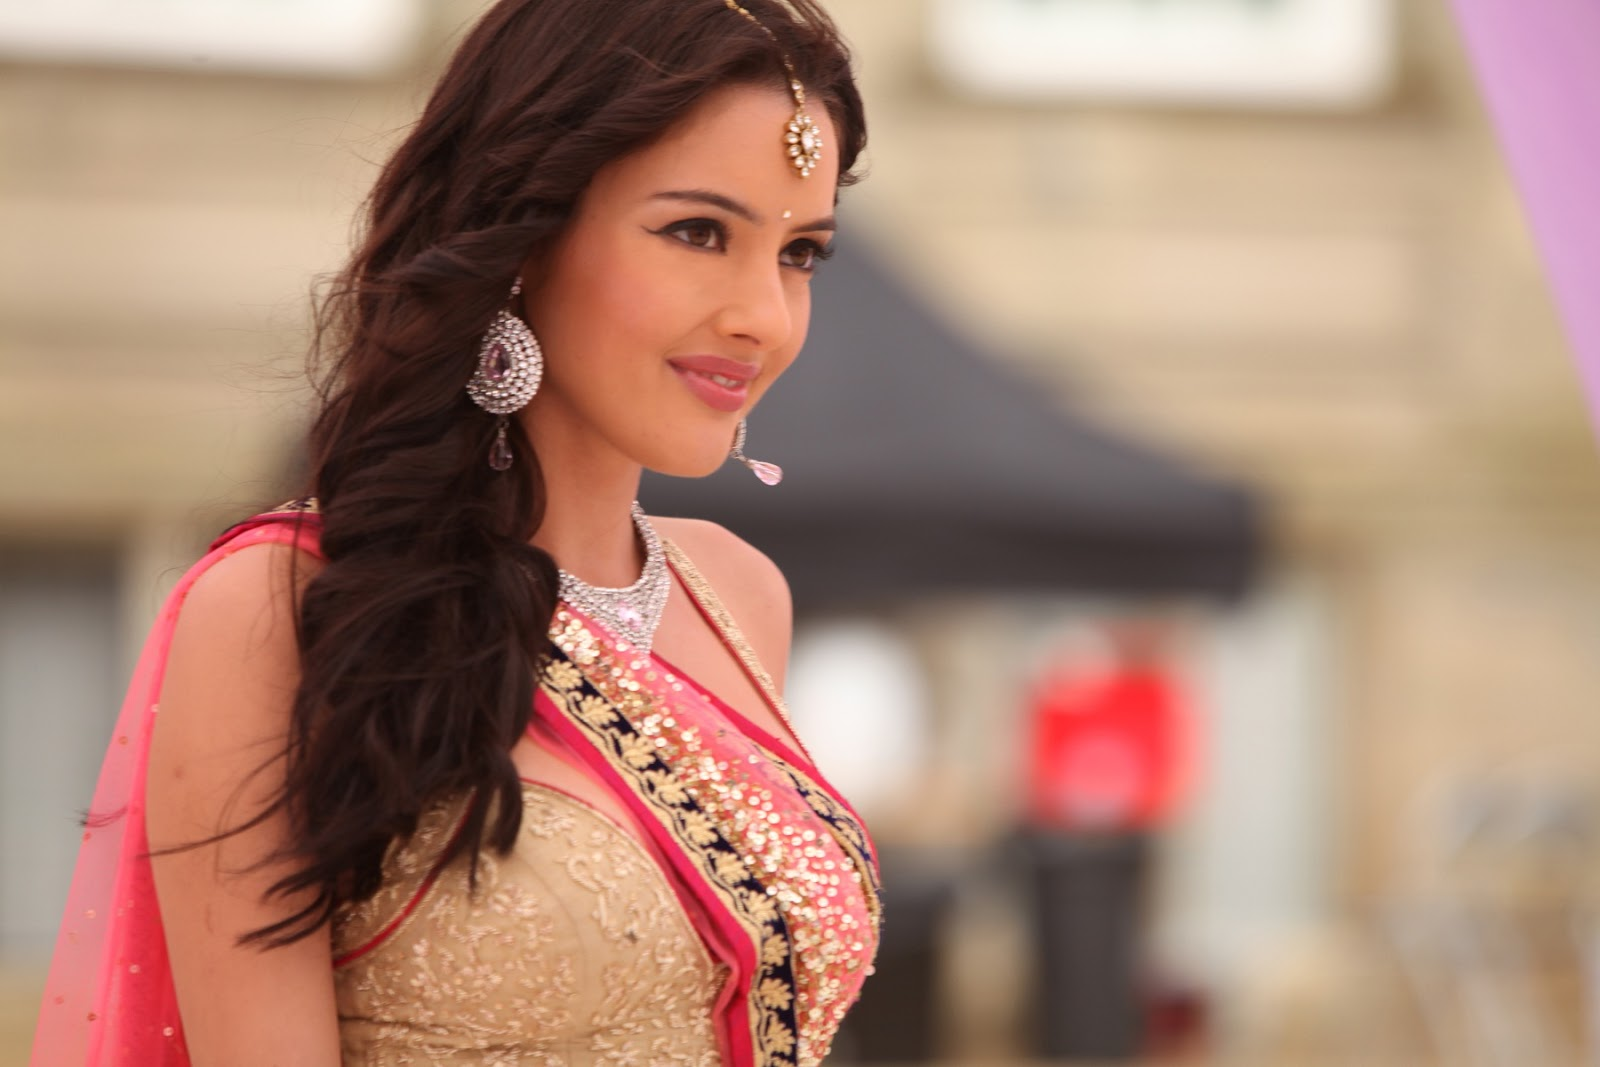 بالصور صور جميلات بوليود صور هنديات جميلات صور جميلات الهند , اجمل نساء الهنديات 3844 6